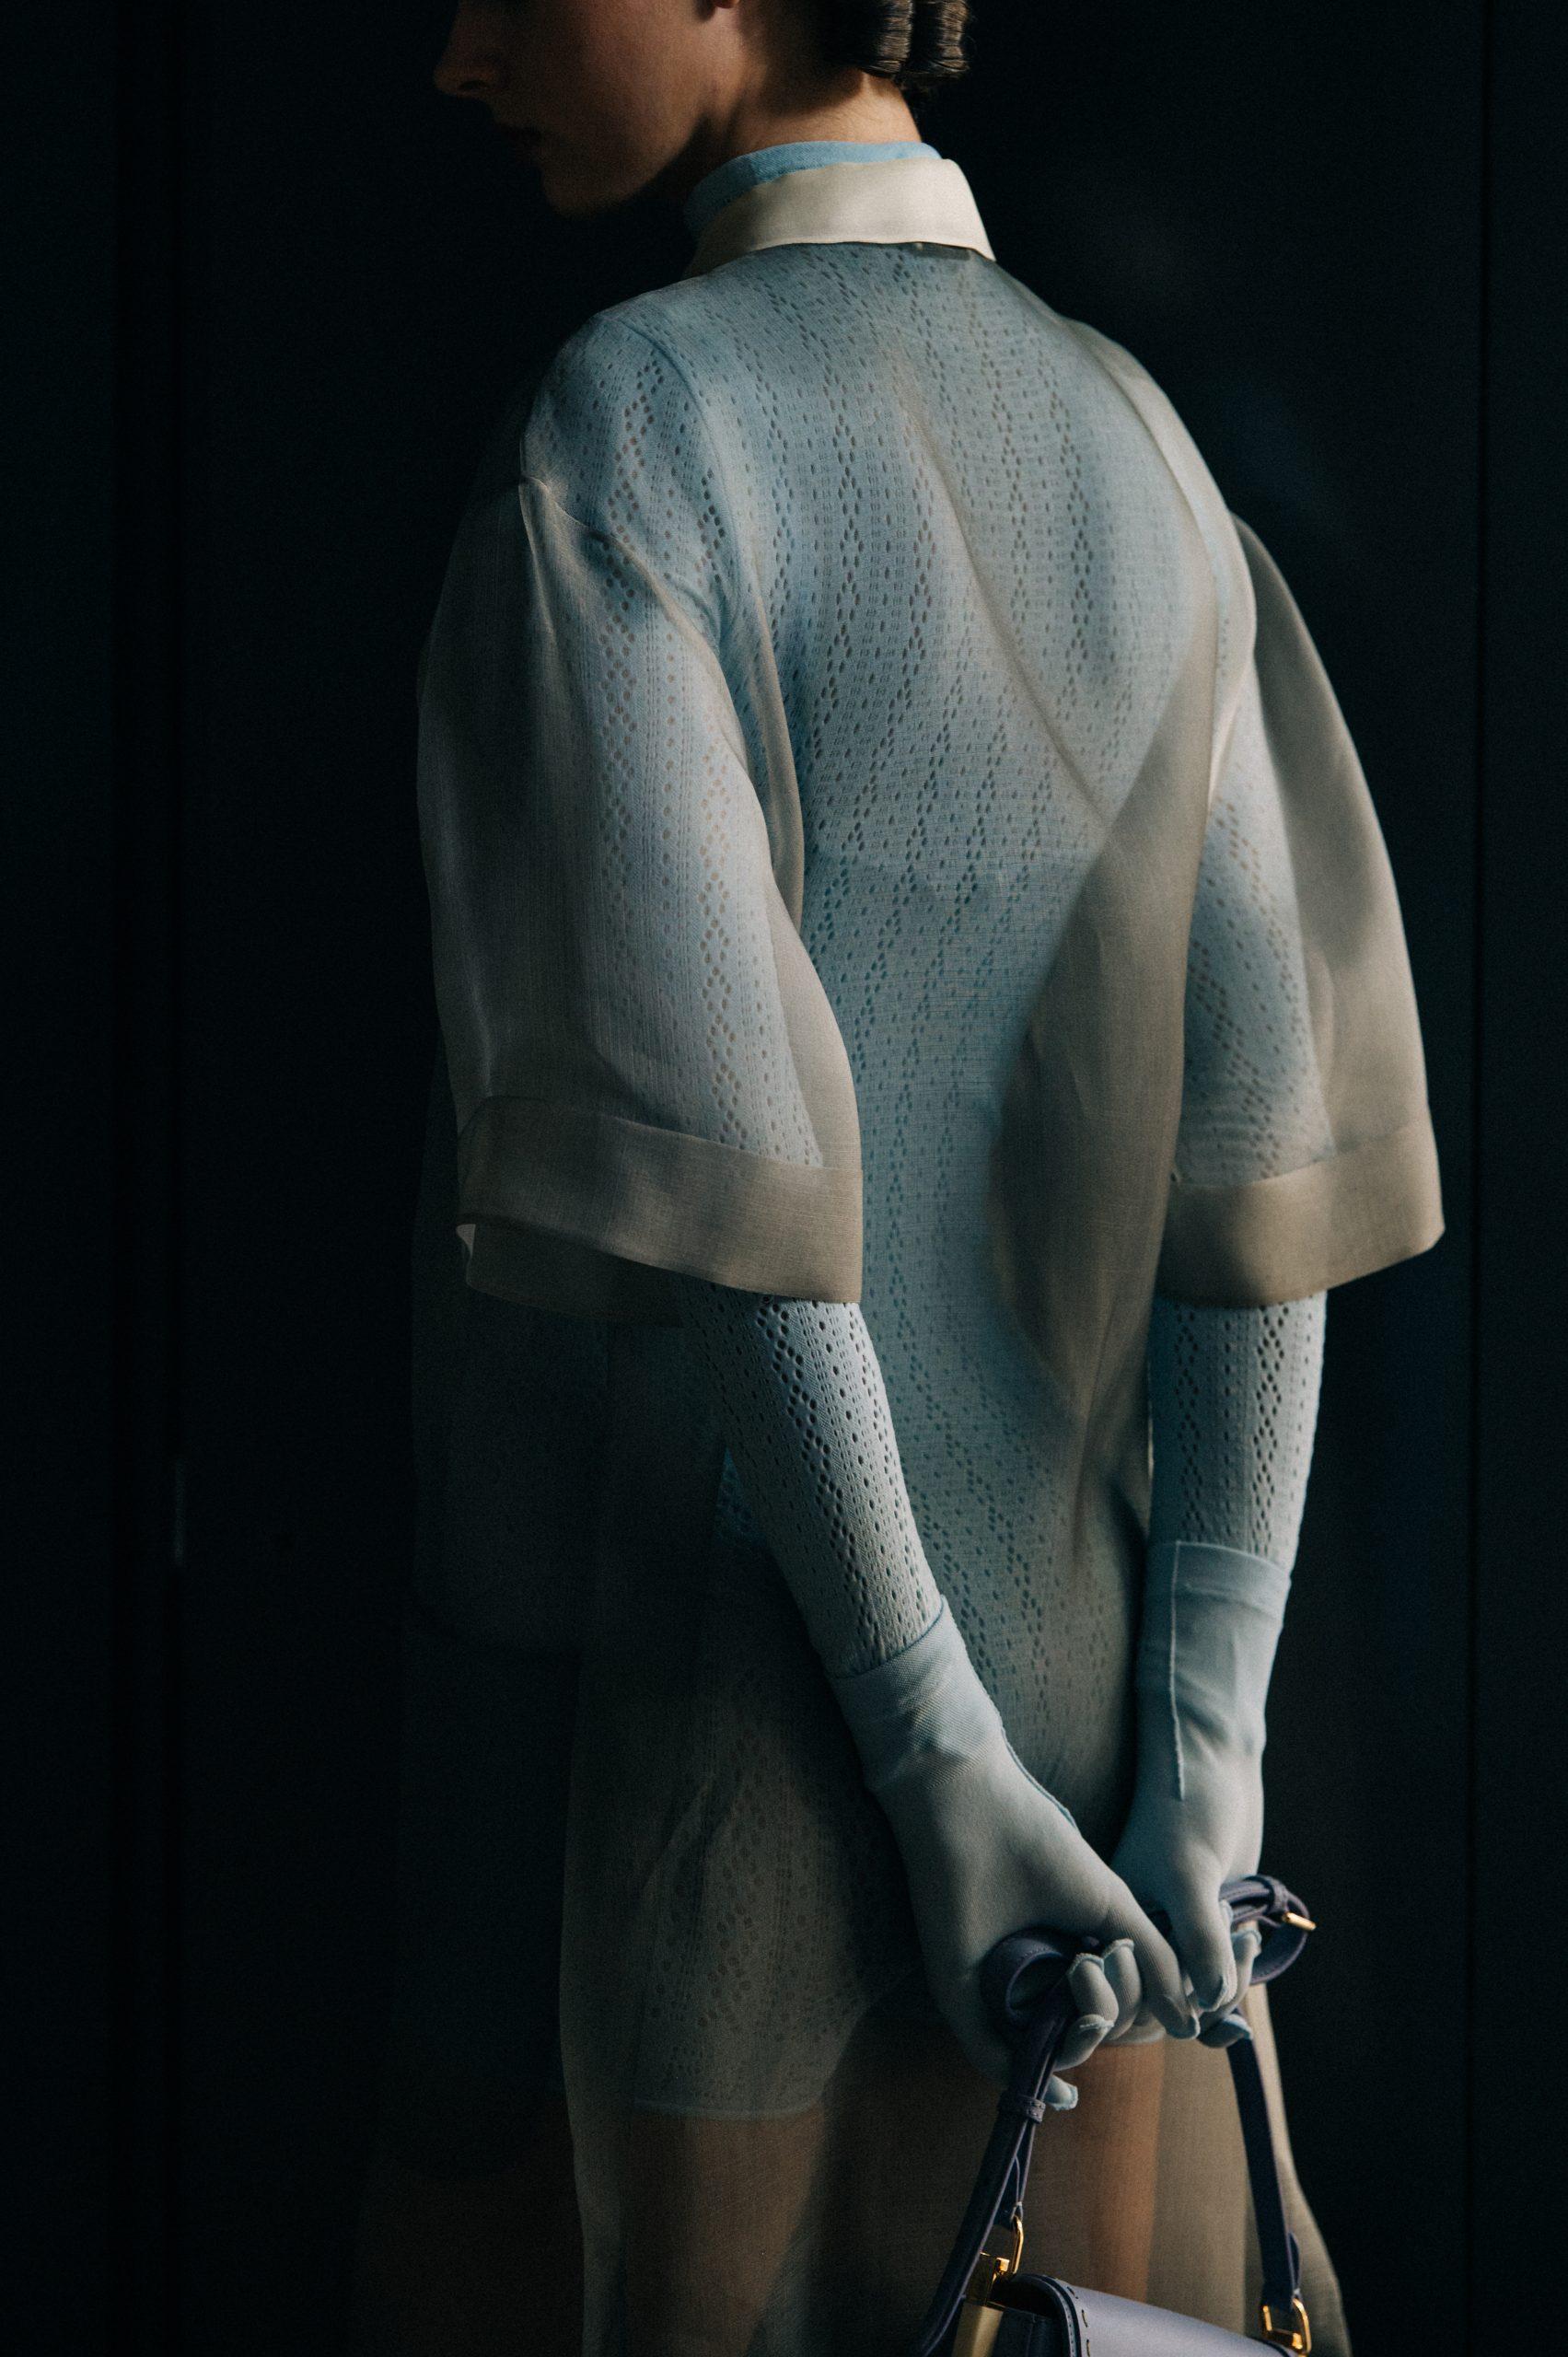 Adam Katz Photographer on Milan Fashion Week